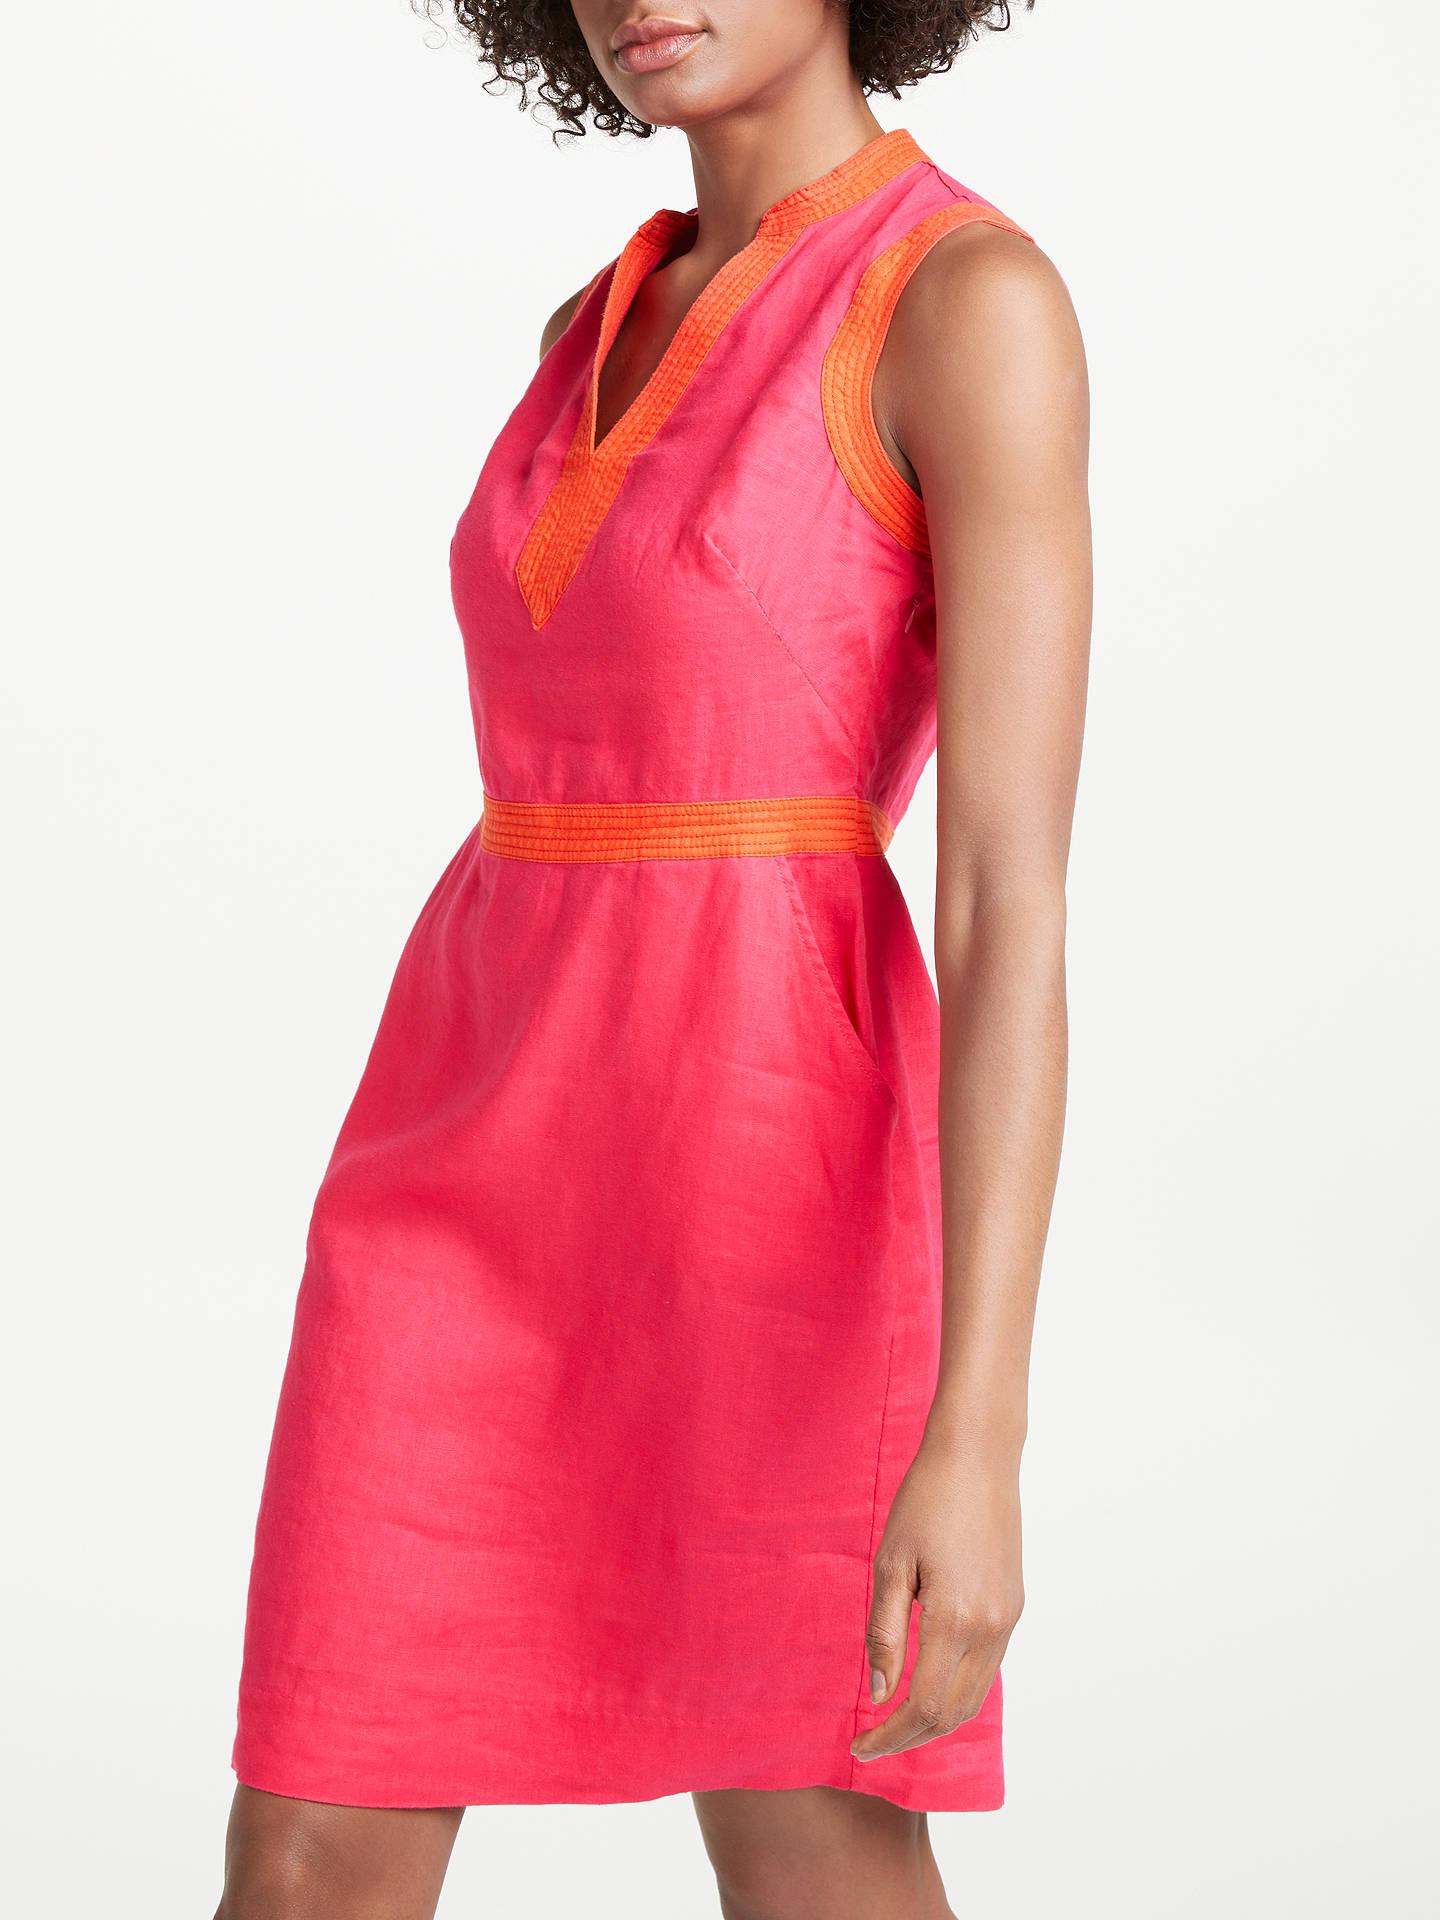 27cb920a5b Buy Boden Linen Notch Neck Dress, Carnival Pink, 8 Online at johnlewis.com  ...